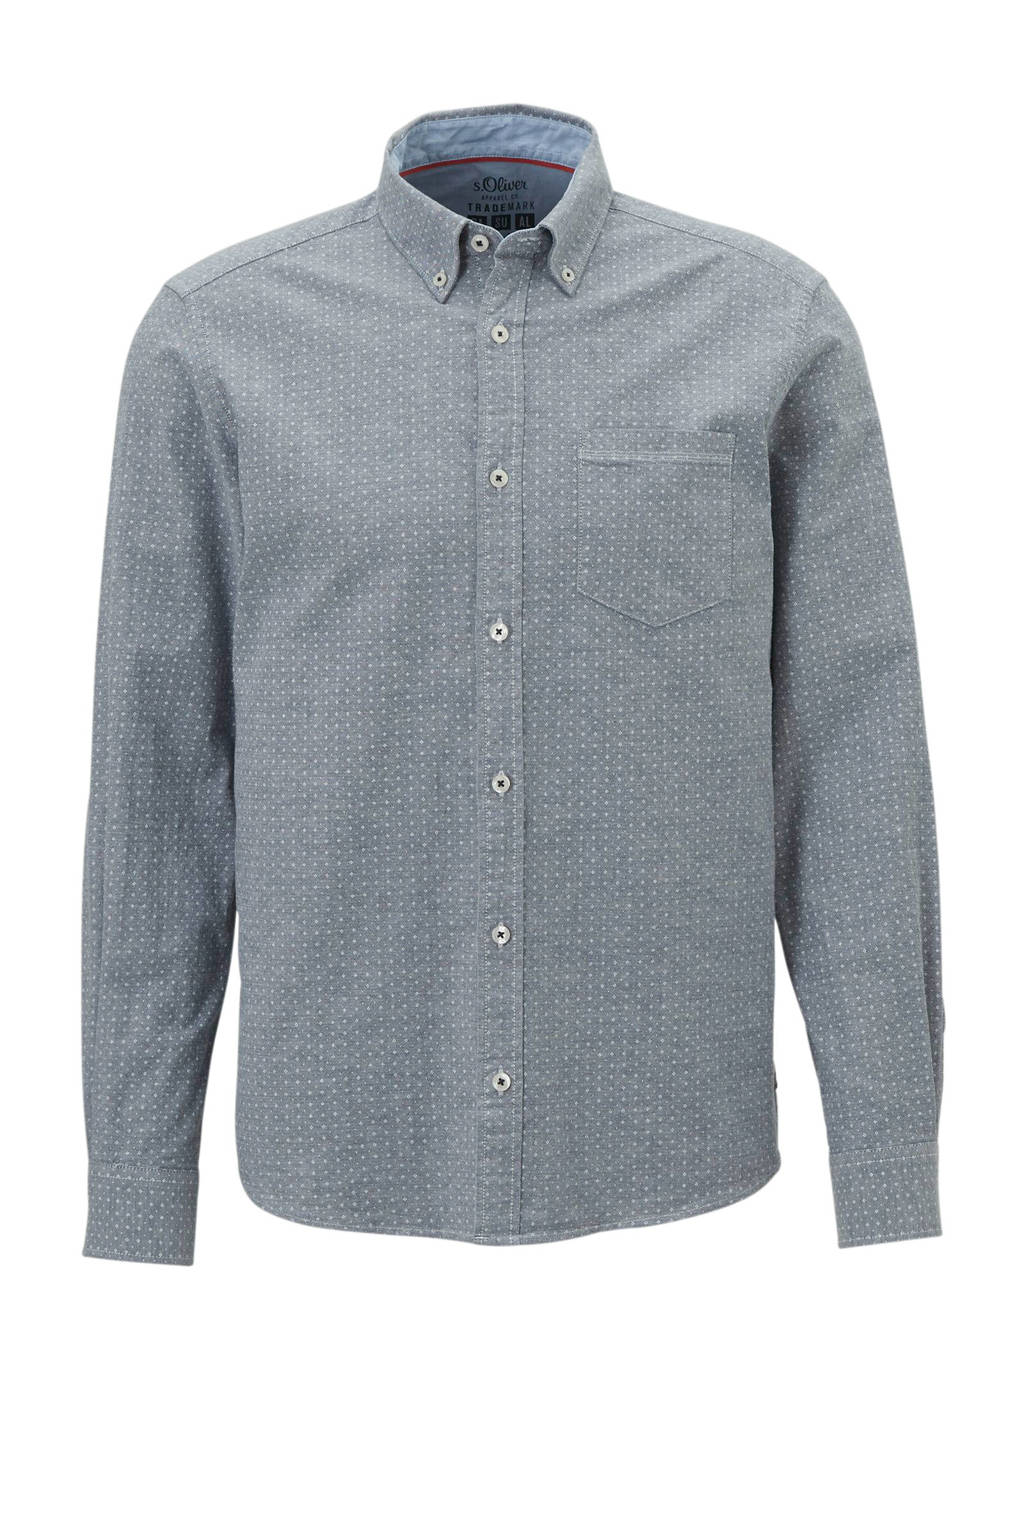 s.Oliver regular fit overhemd, Blauw